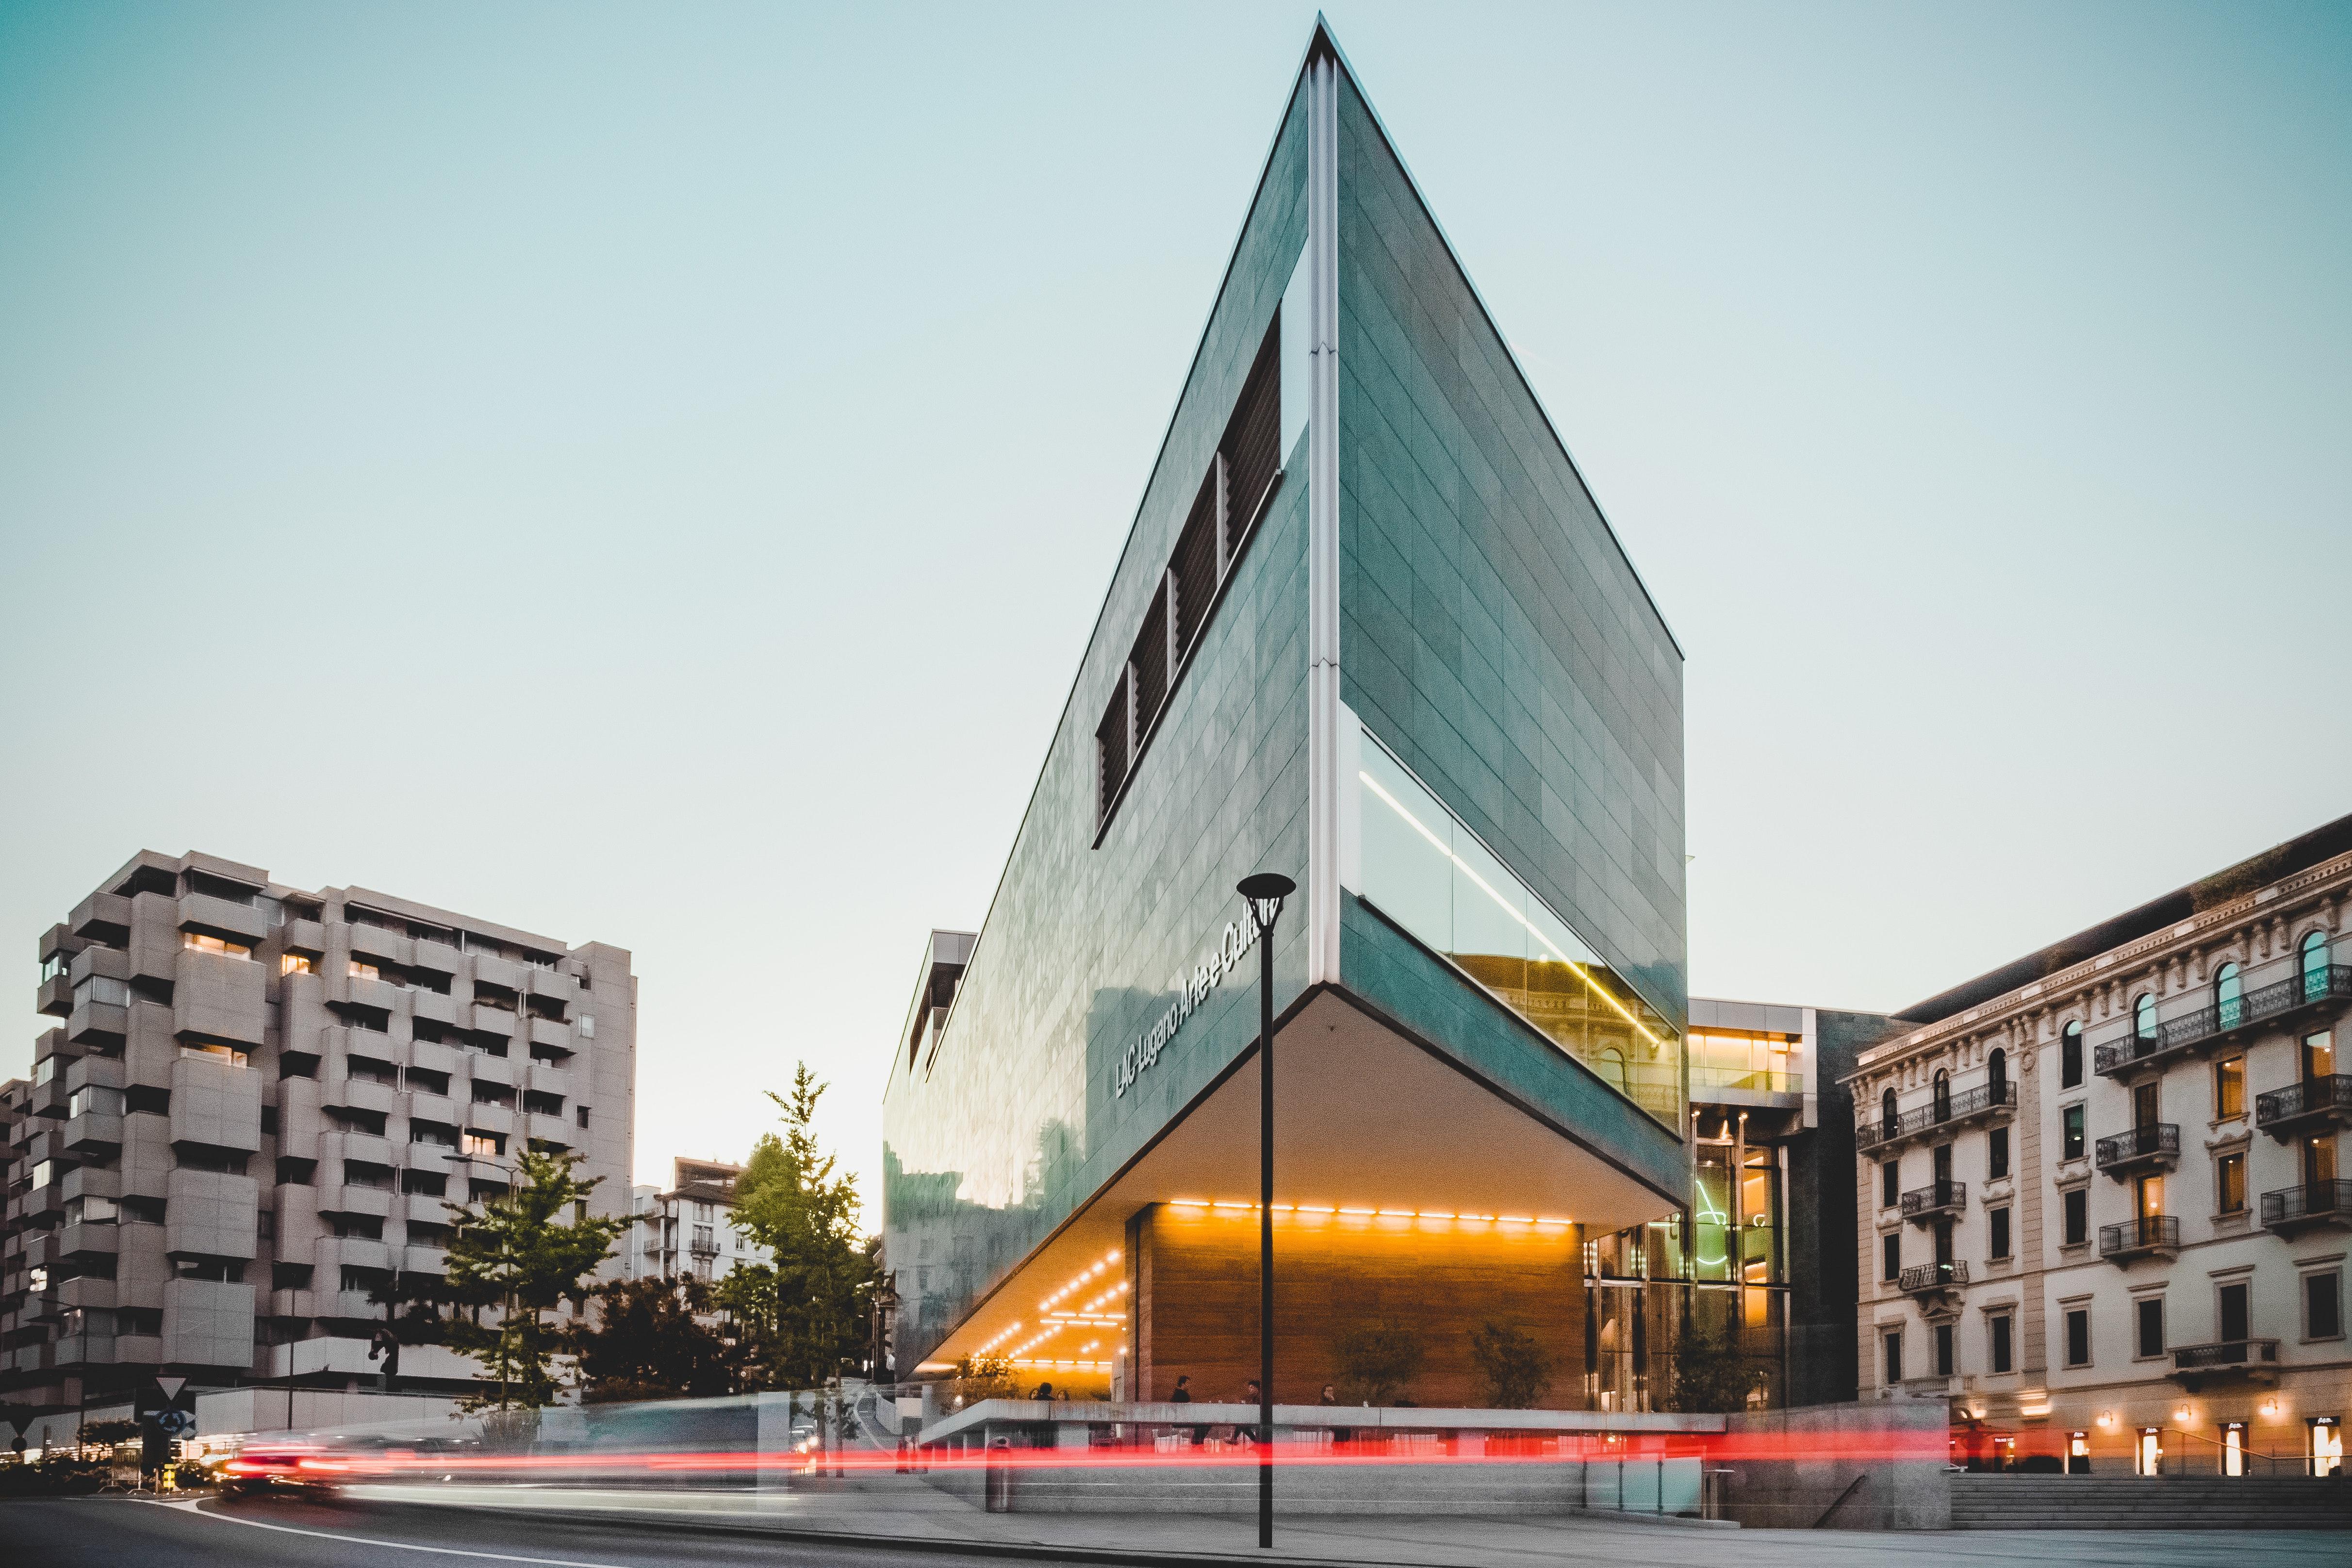 View of Triangular Building · Free Stock Photo